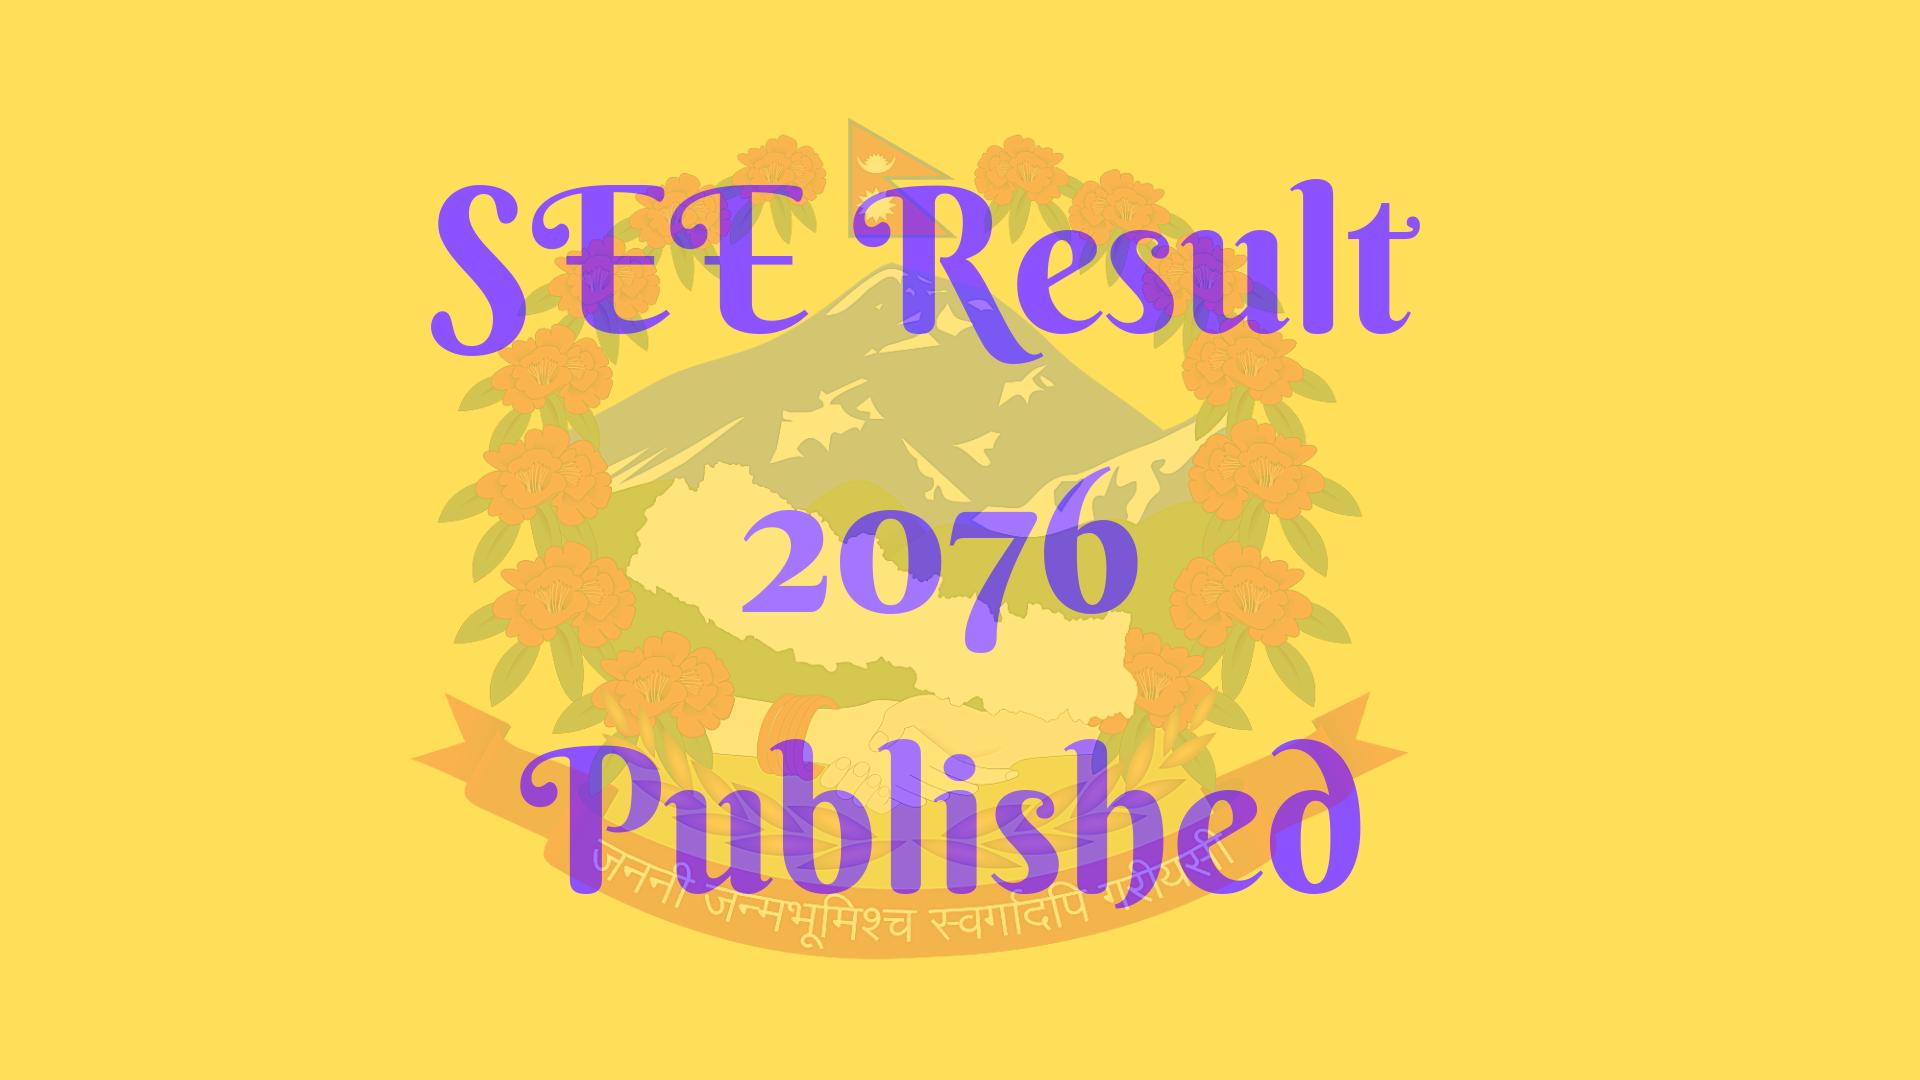 SEE Result 2076 Published